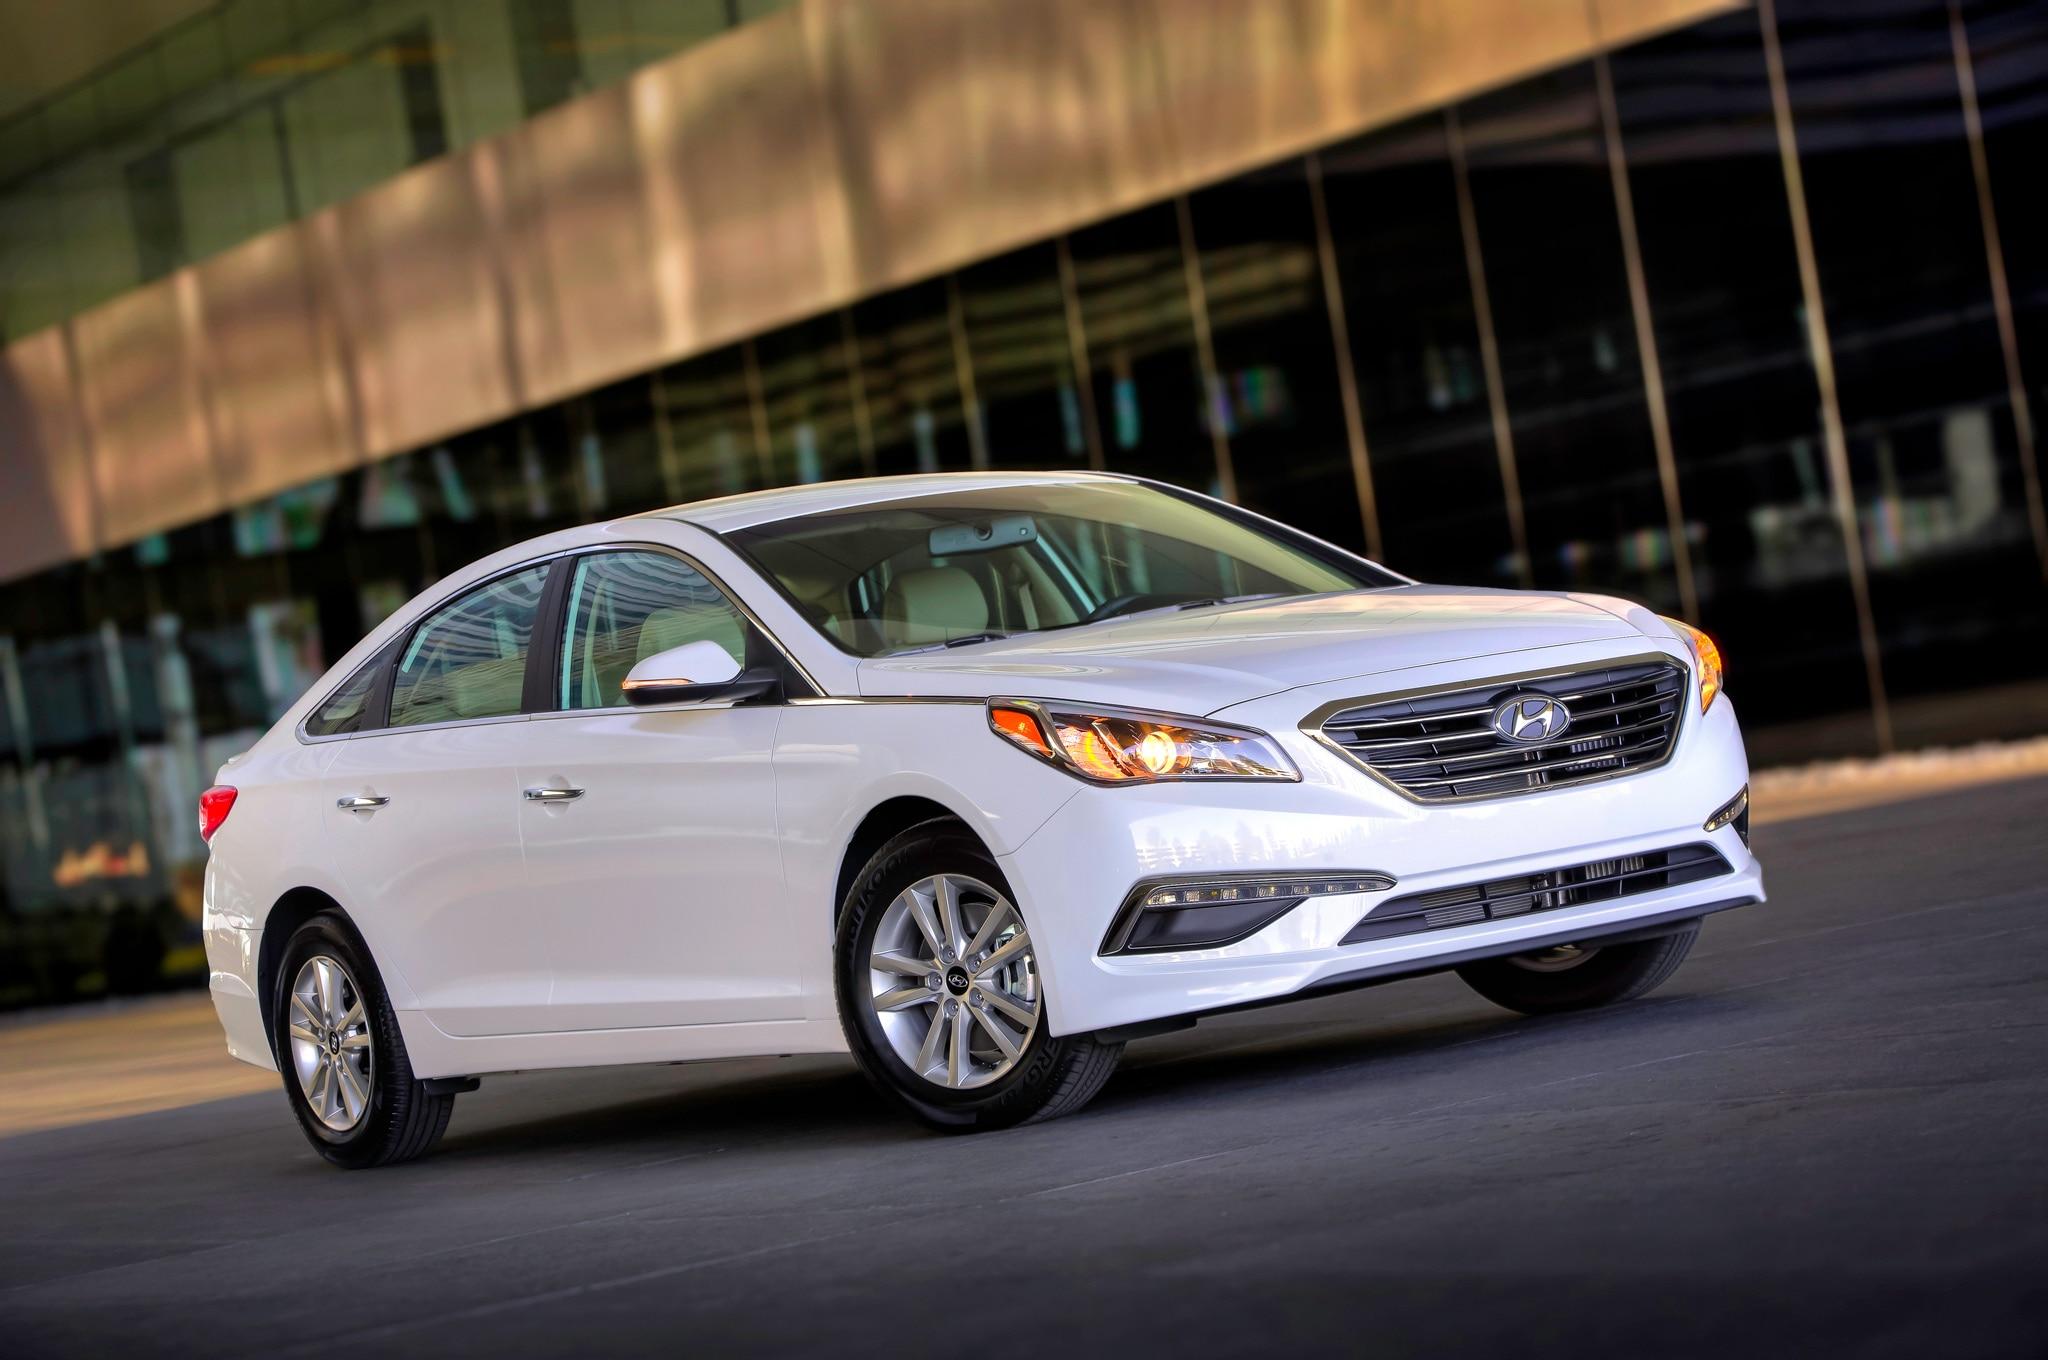 2015 Hyundai Sonata Eco Front Side Motion Full View1